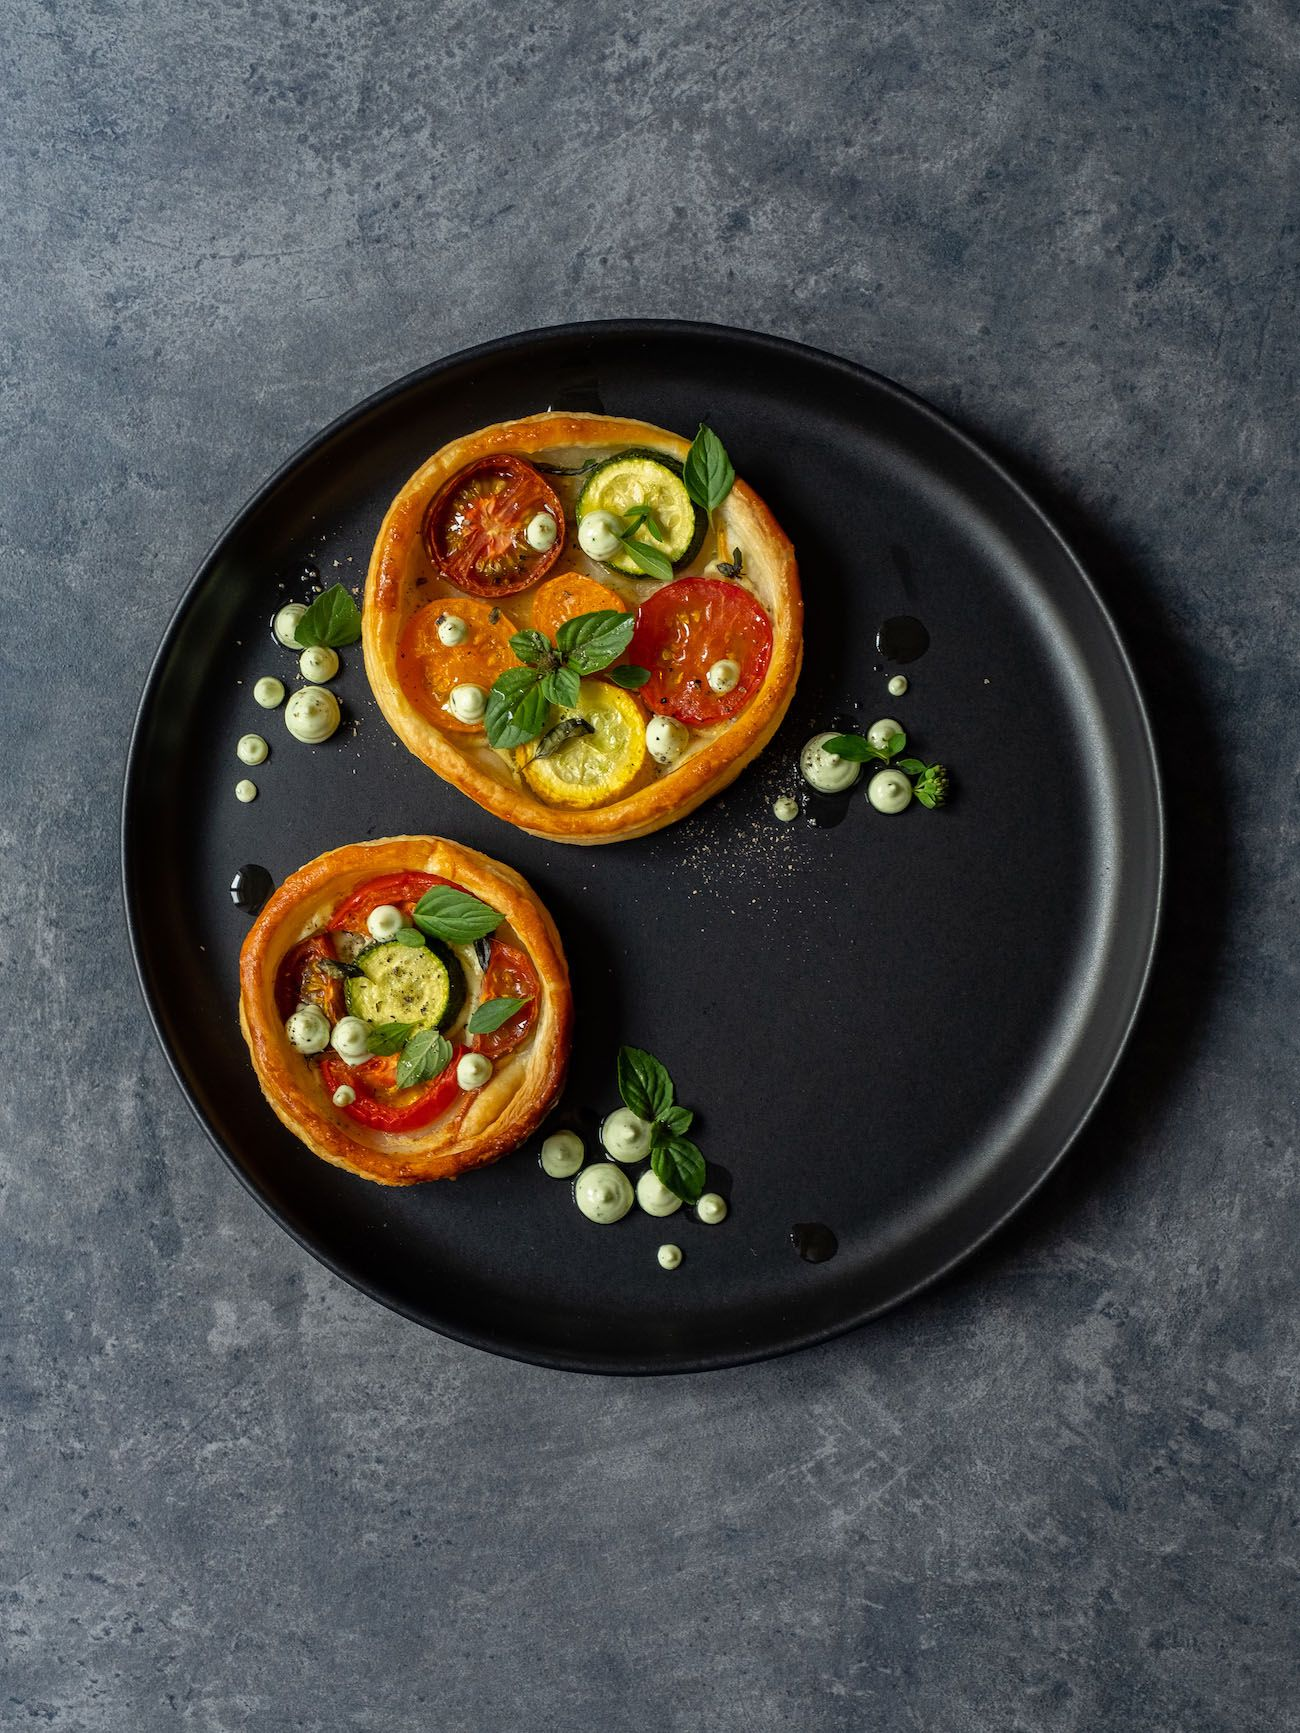 Rezept, Foodblog, About Fuel, Tomaten Zucchini Tartelettes mit Basilikum Feta Creme, Teller